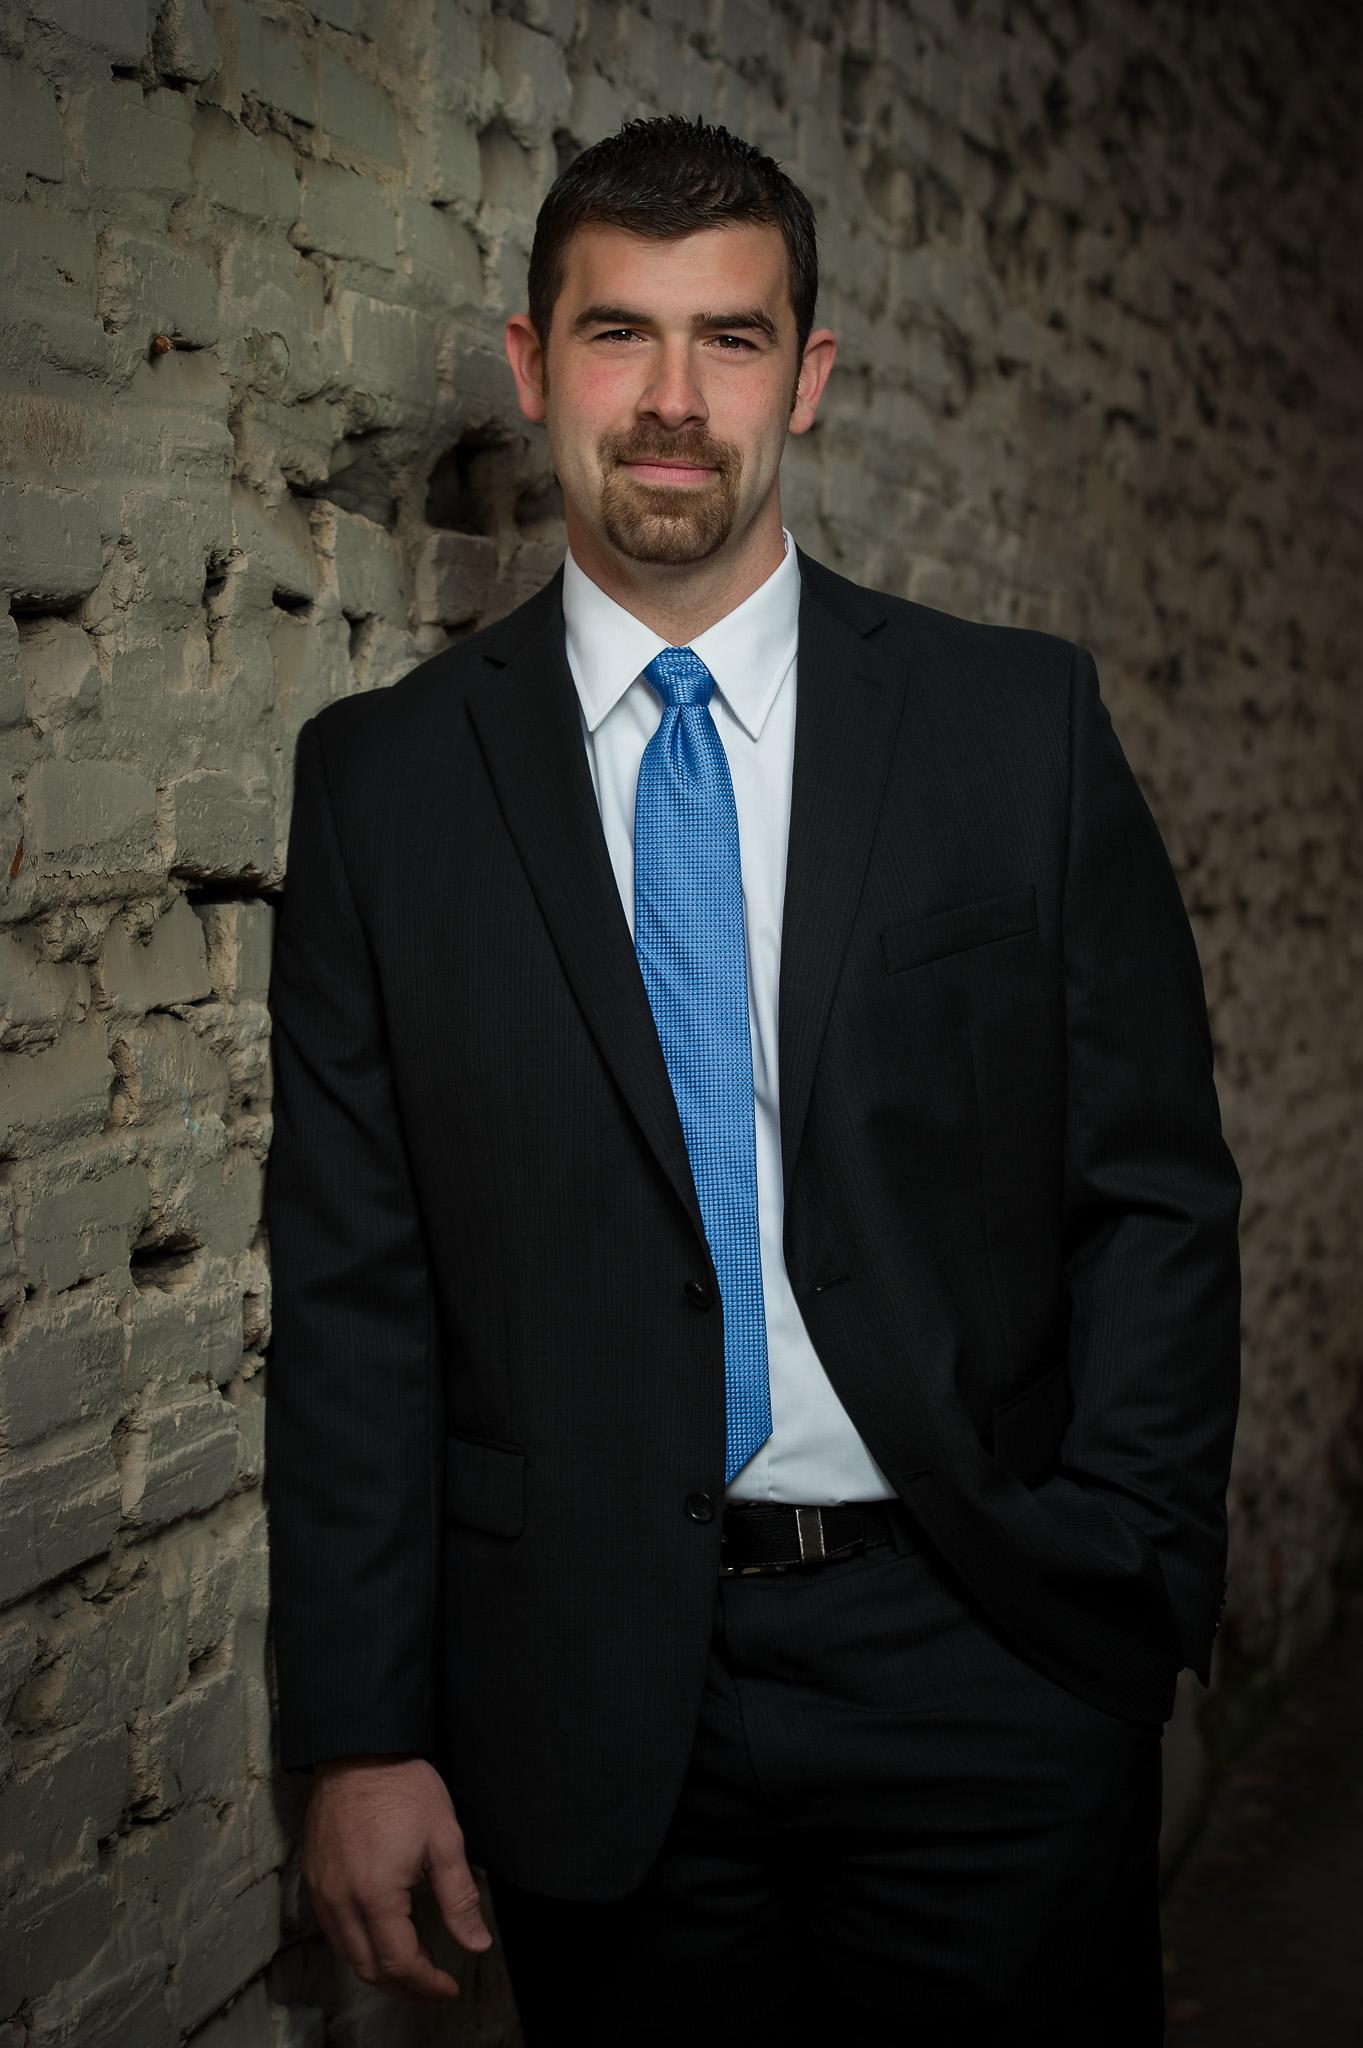 Robert McNicholas